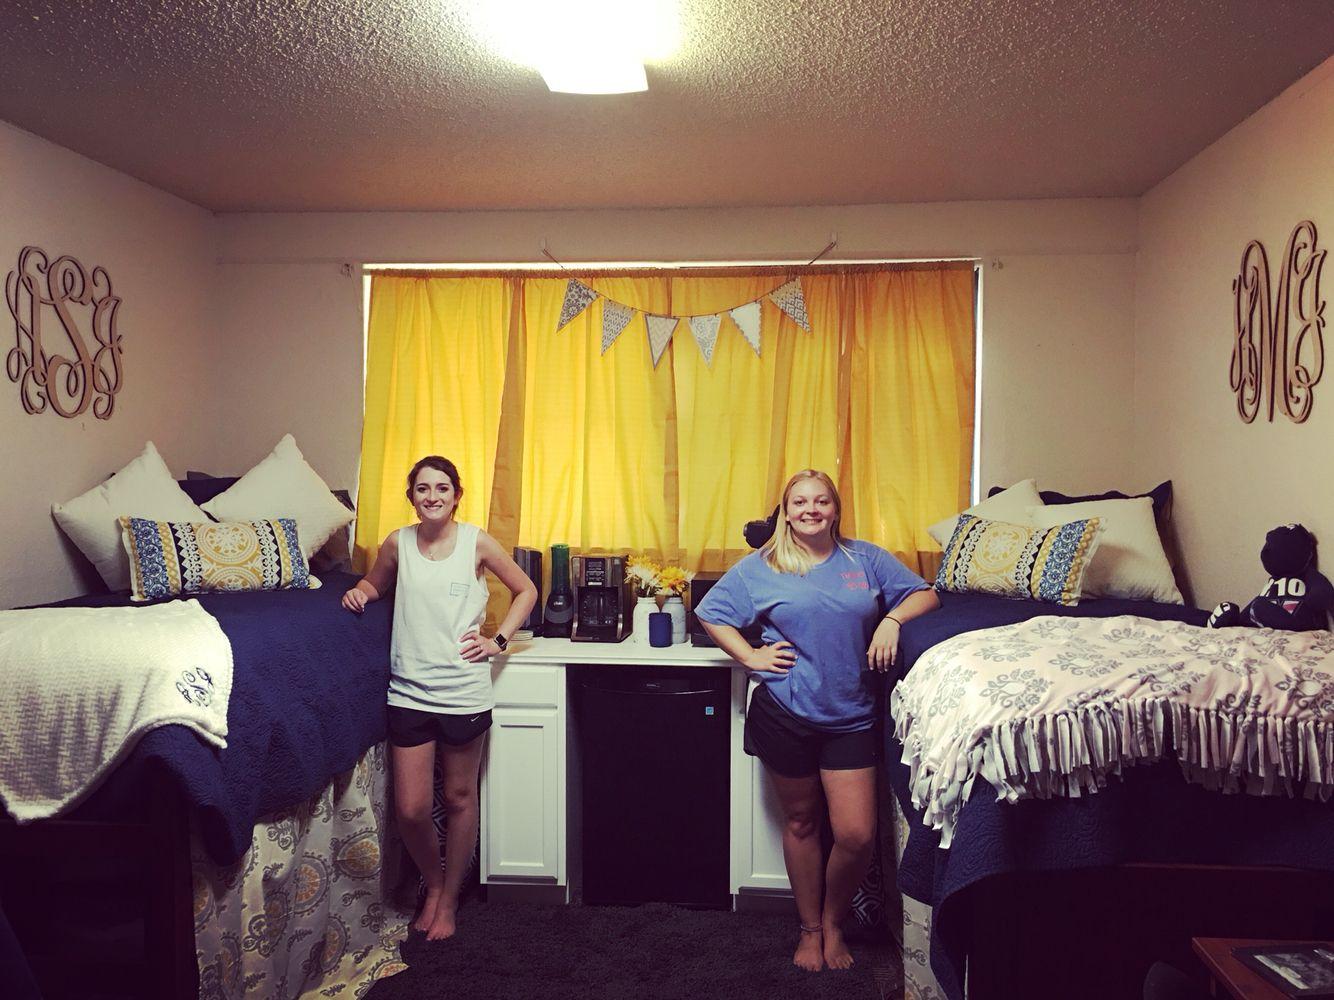 Dorm Room Northeastern State University Tahlequah Ok University Dorms Dorm Northeastern State University